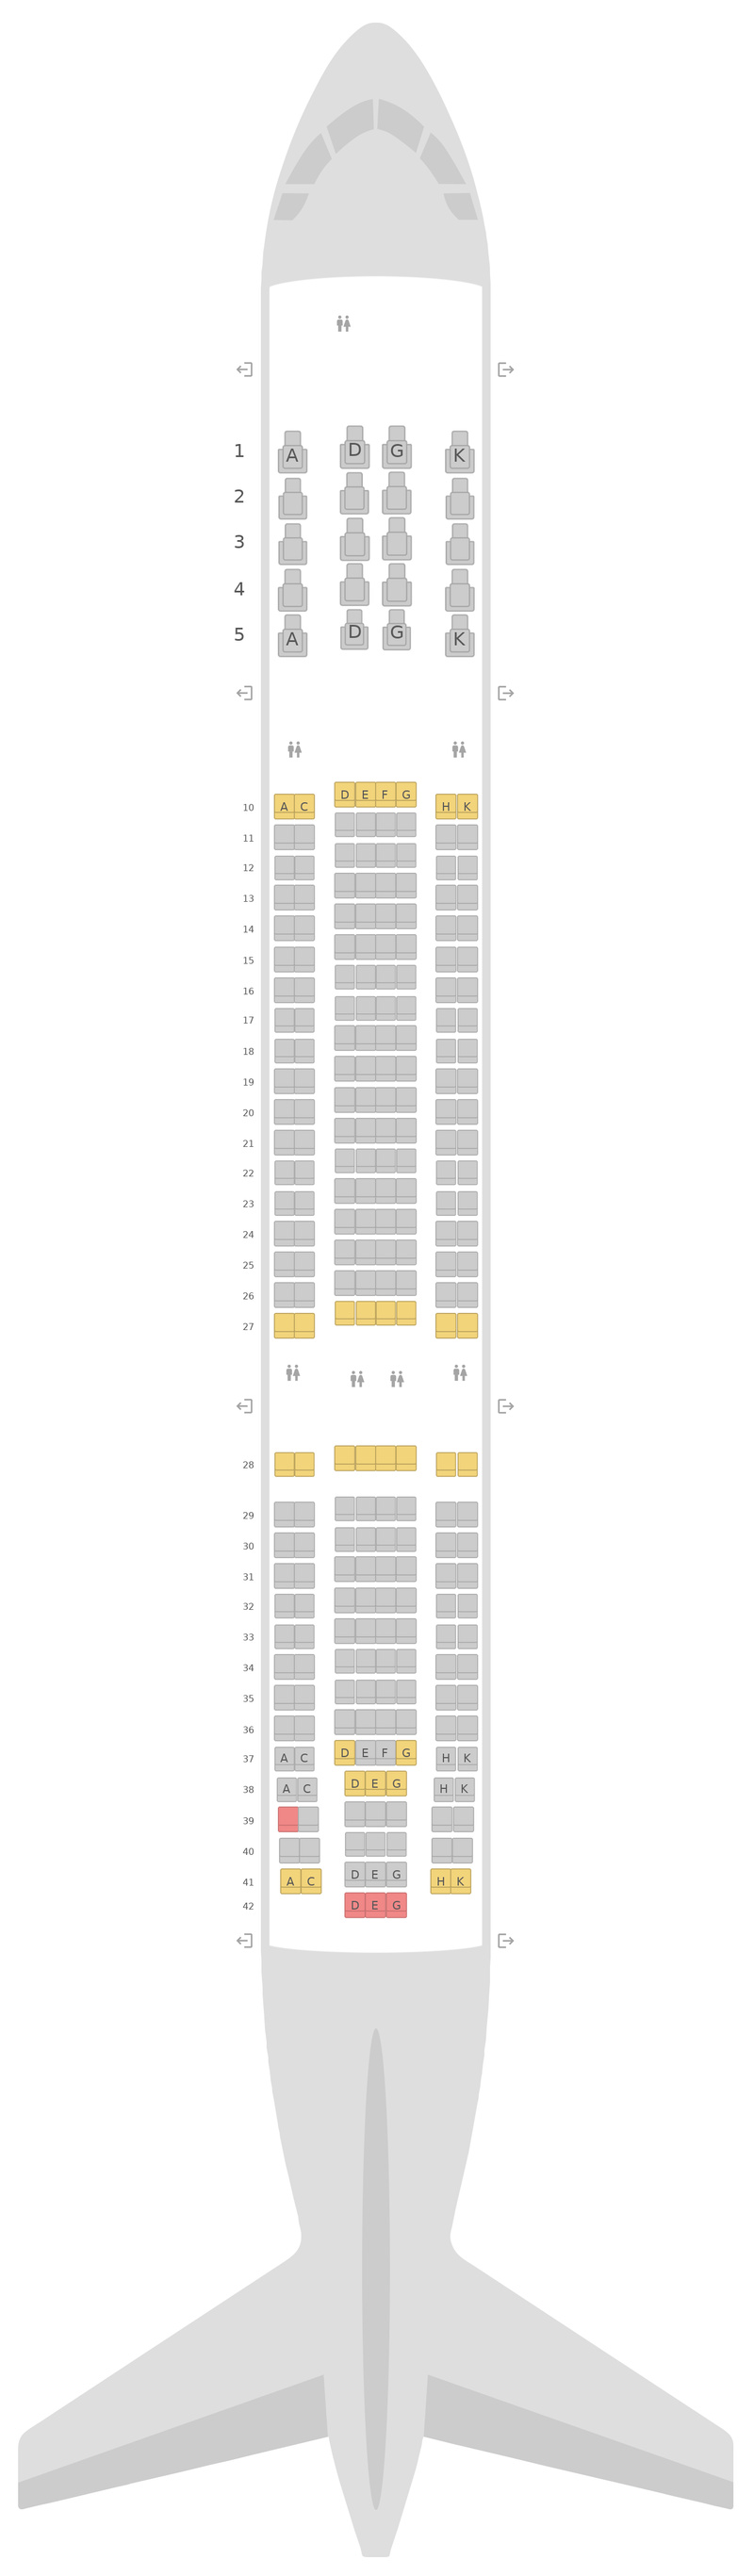 Sitzplan Airbus A330-200 (332) Virgin Australia